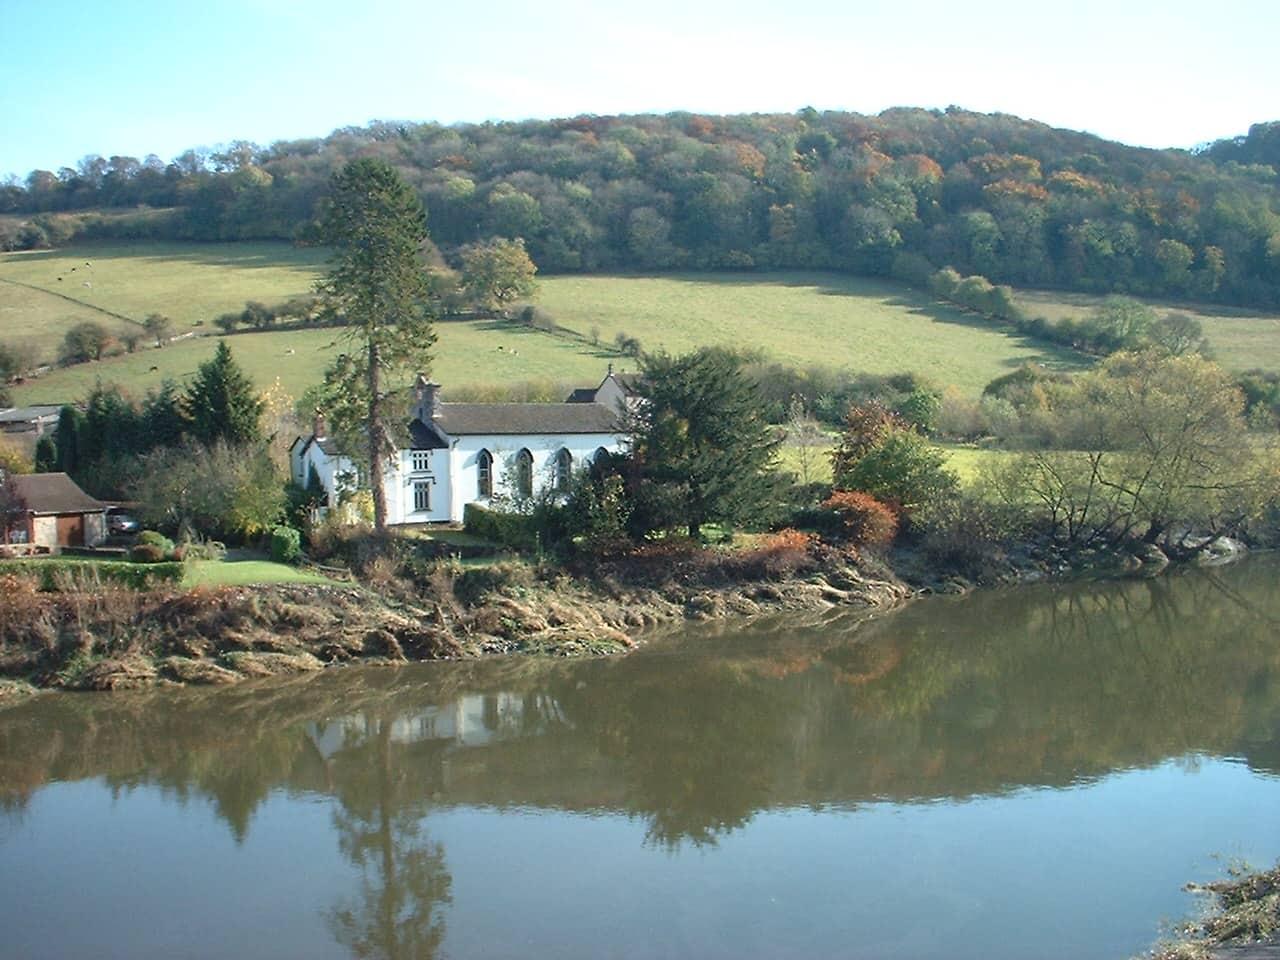 Walks along the River Wye